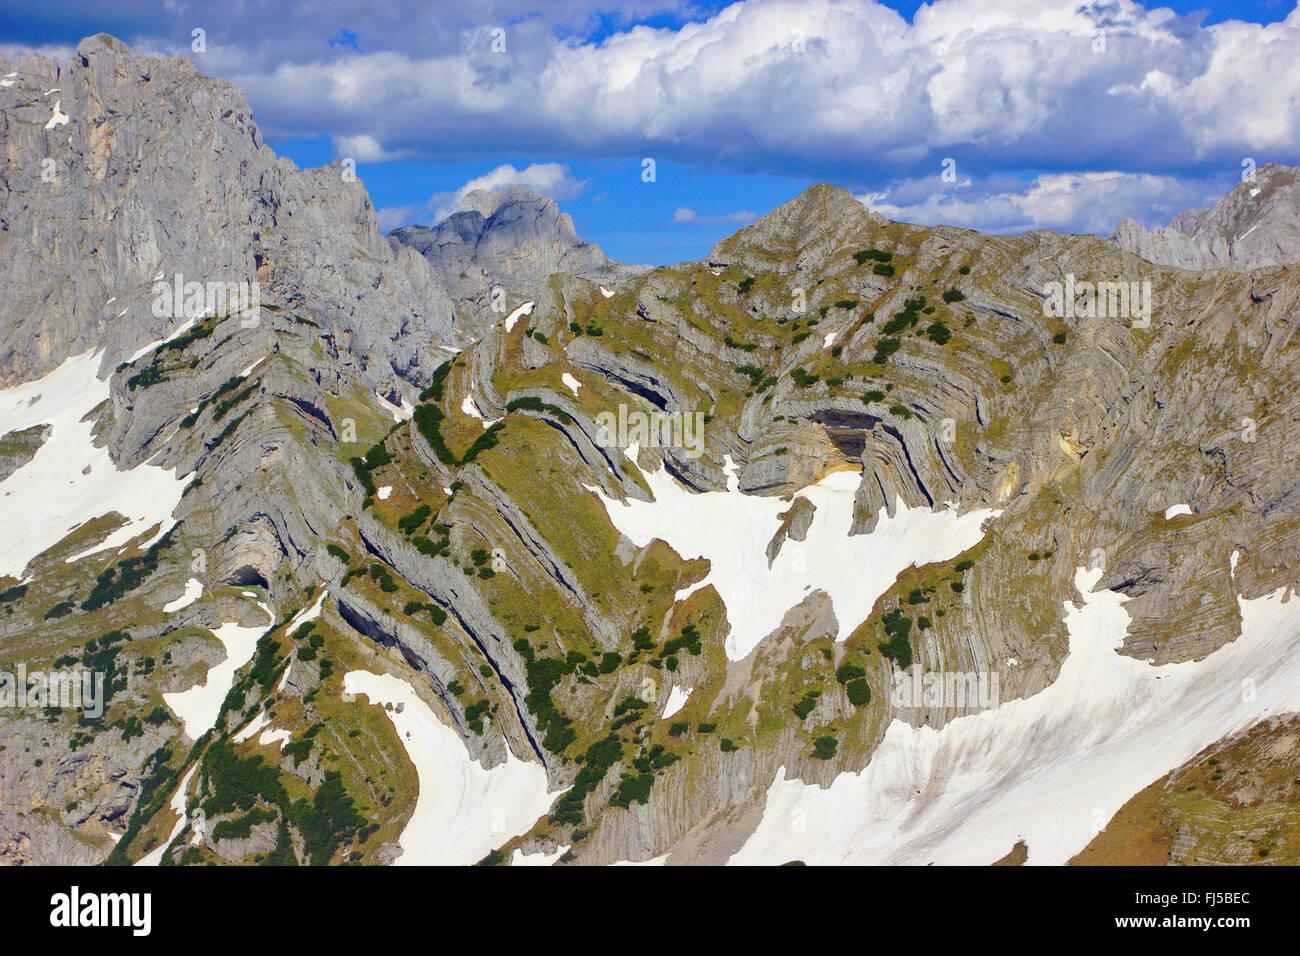 Bobotov Kuk and Stit from ascent to Prutas, Montenegro, Durmitor National Park - Stock Image